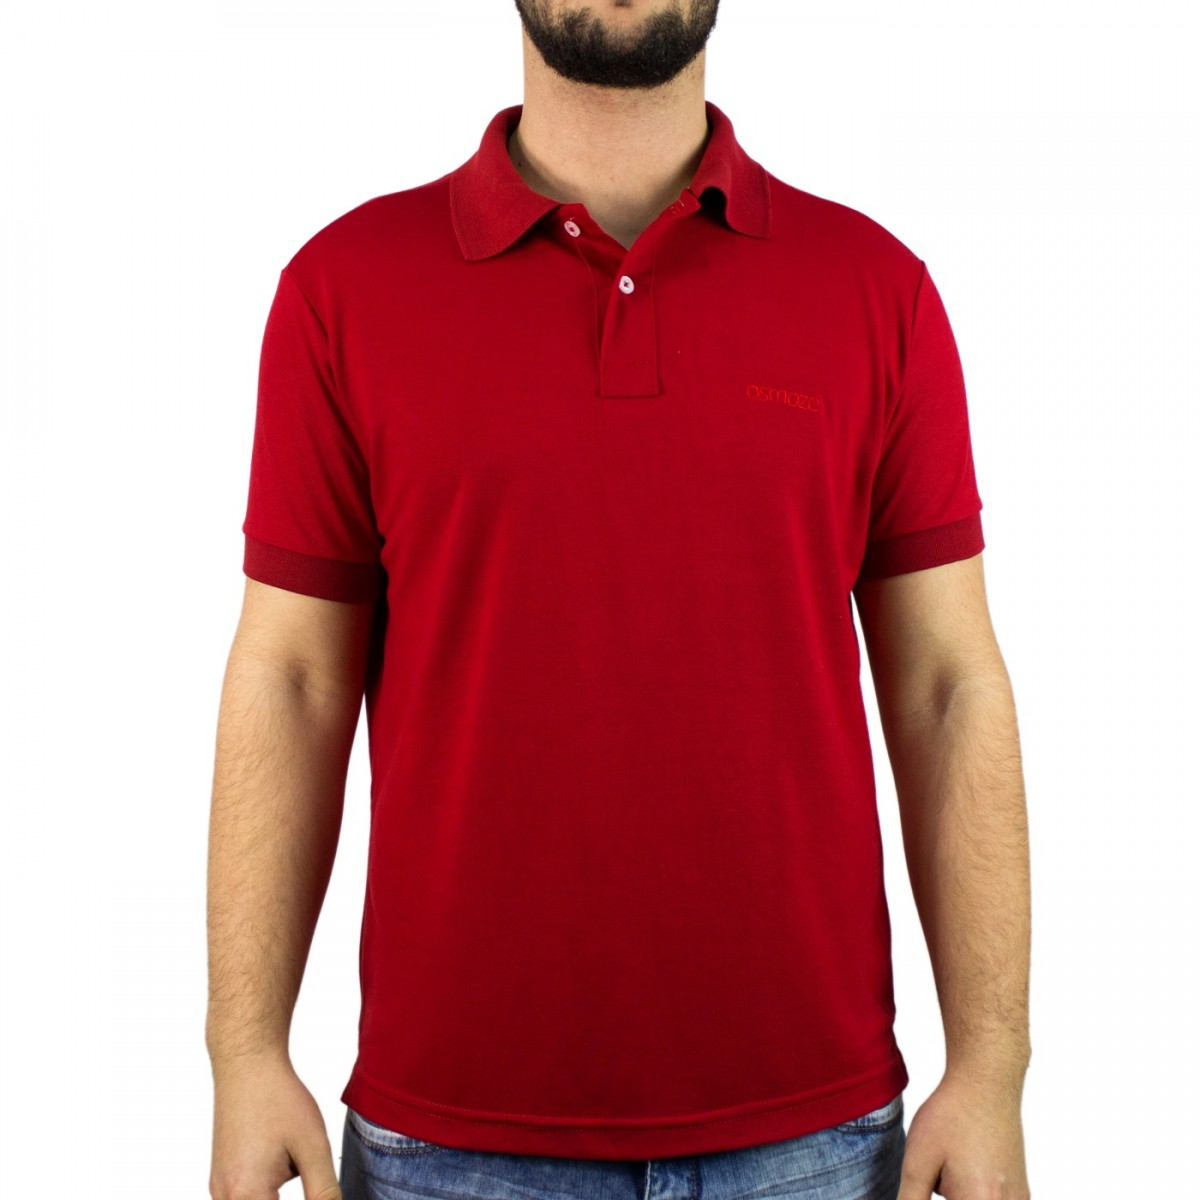 cf5cde465 Bizz Store - Camisa Polo Masculina Osmoze Manga Curta Preta